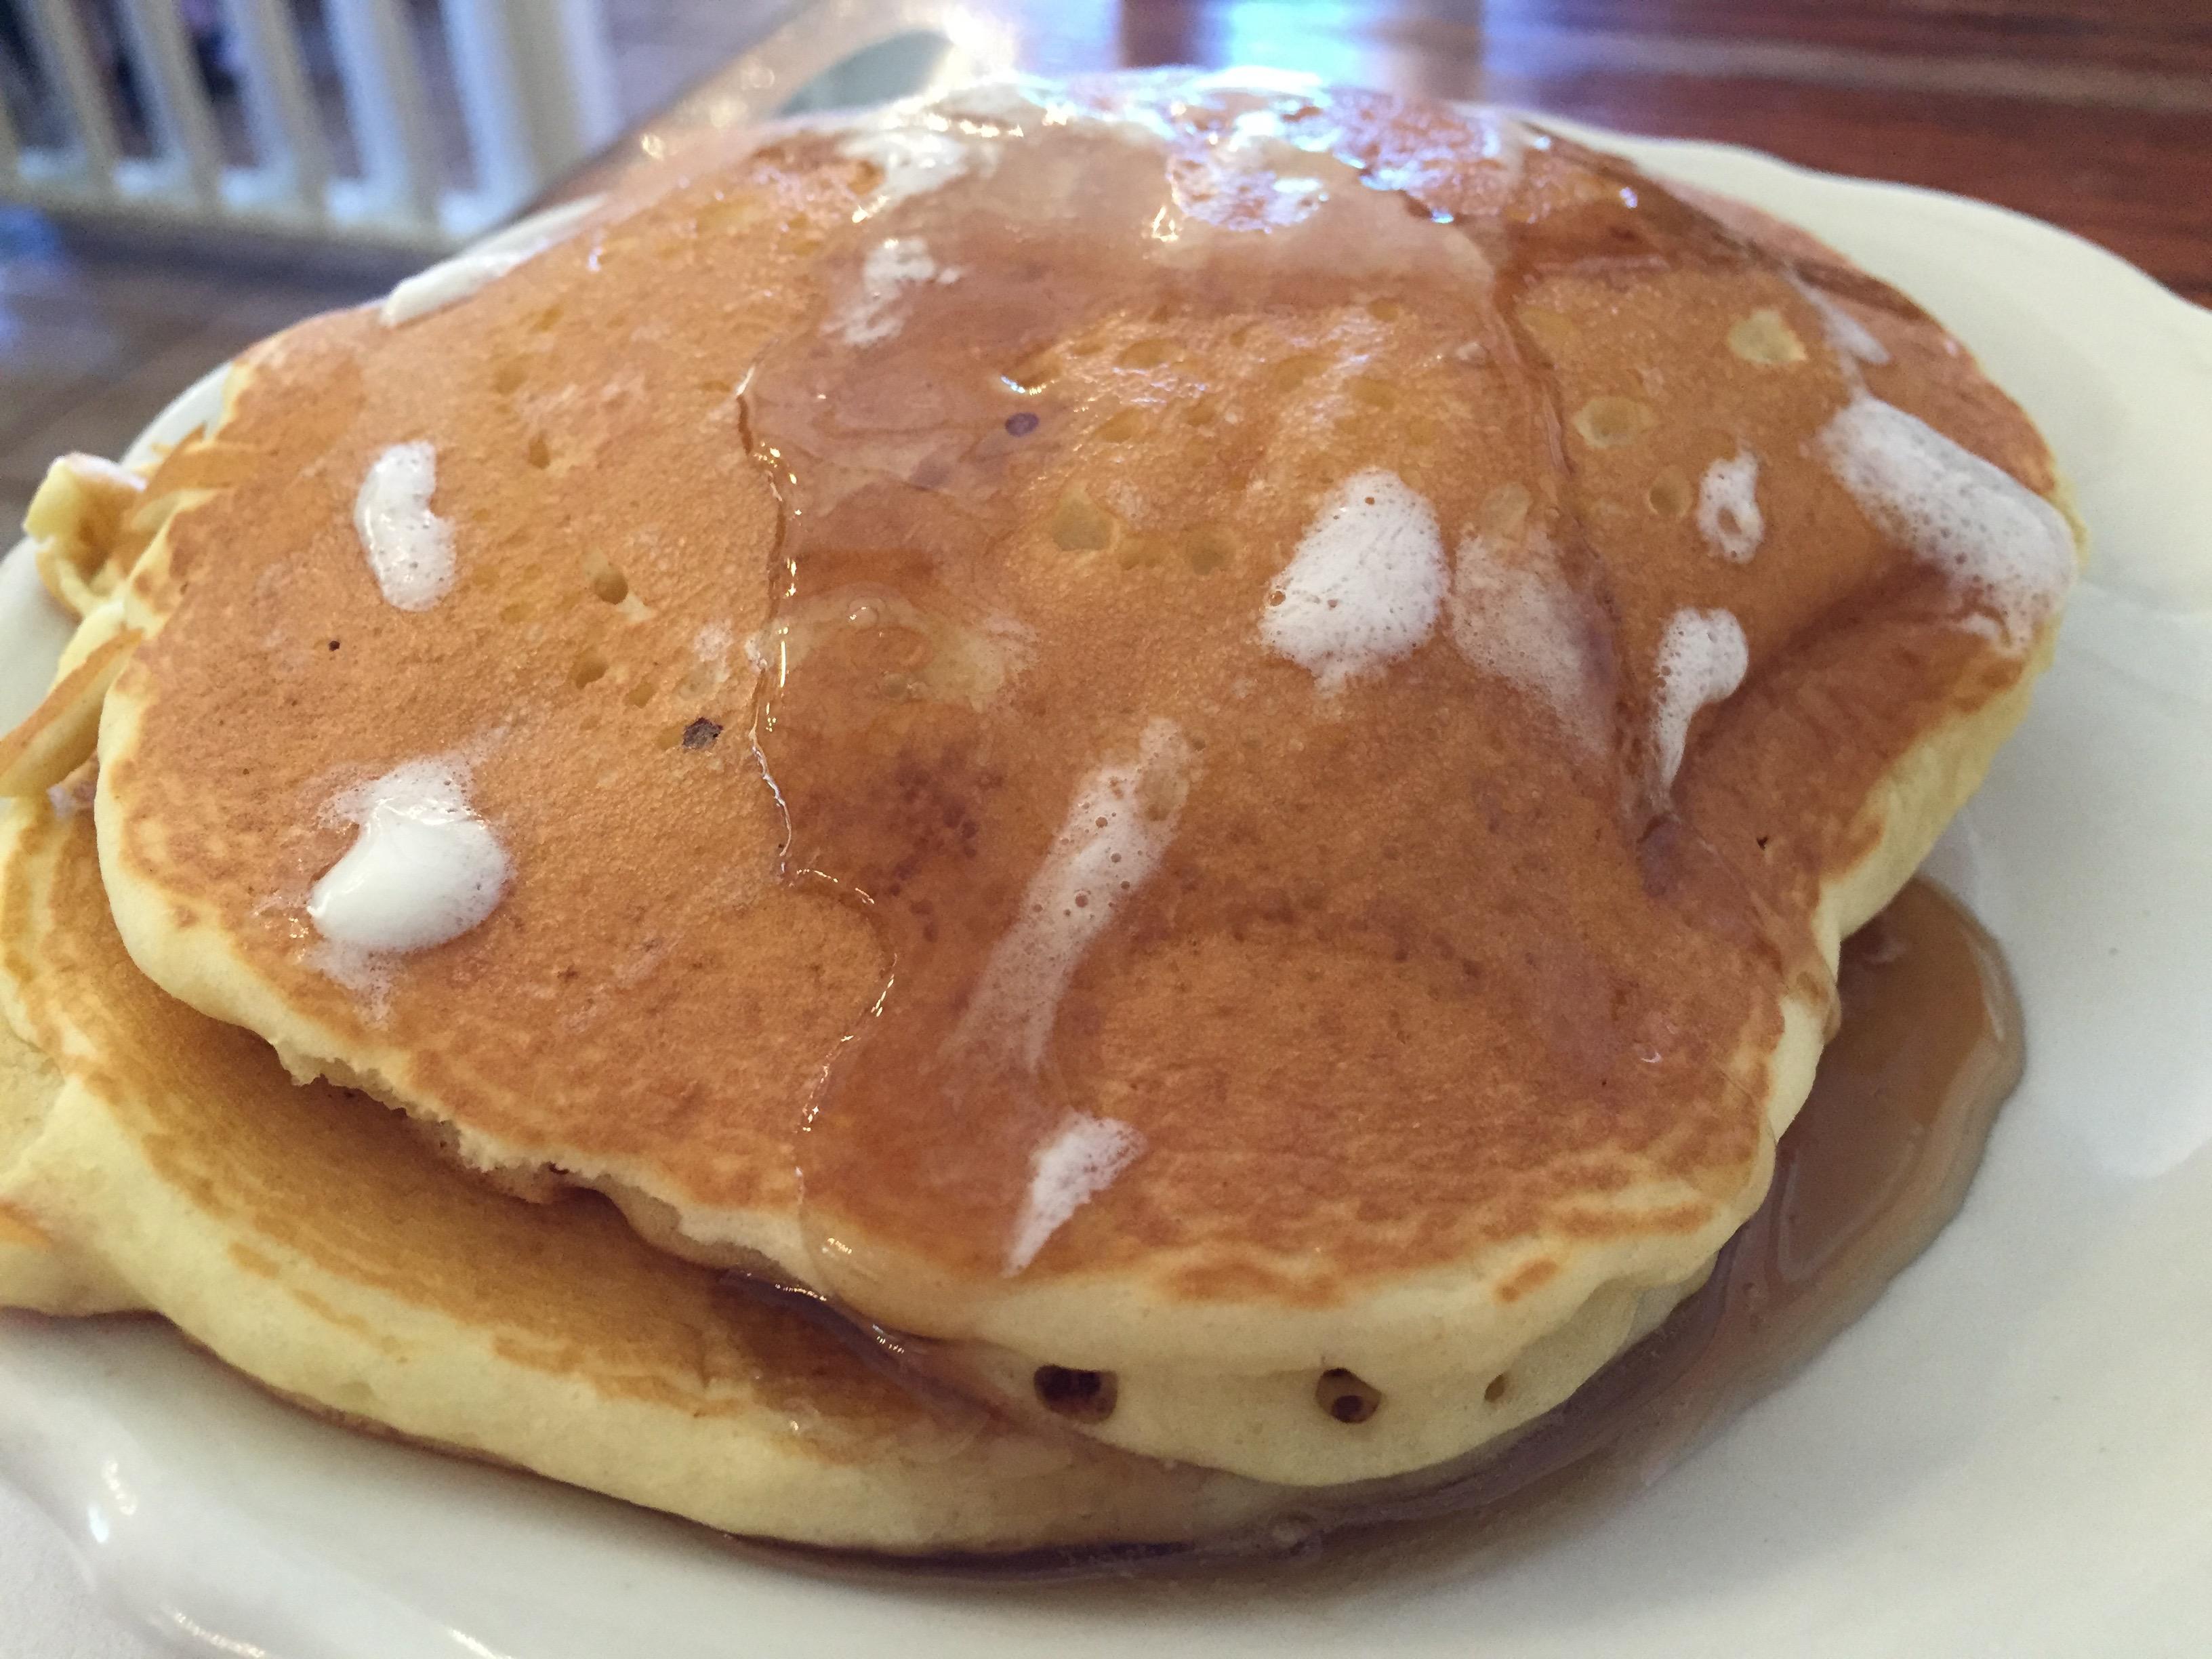 Savory and satisfying and gigantic at The Original Pancake House